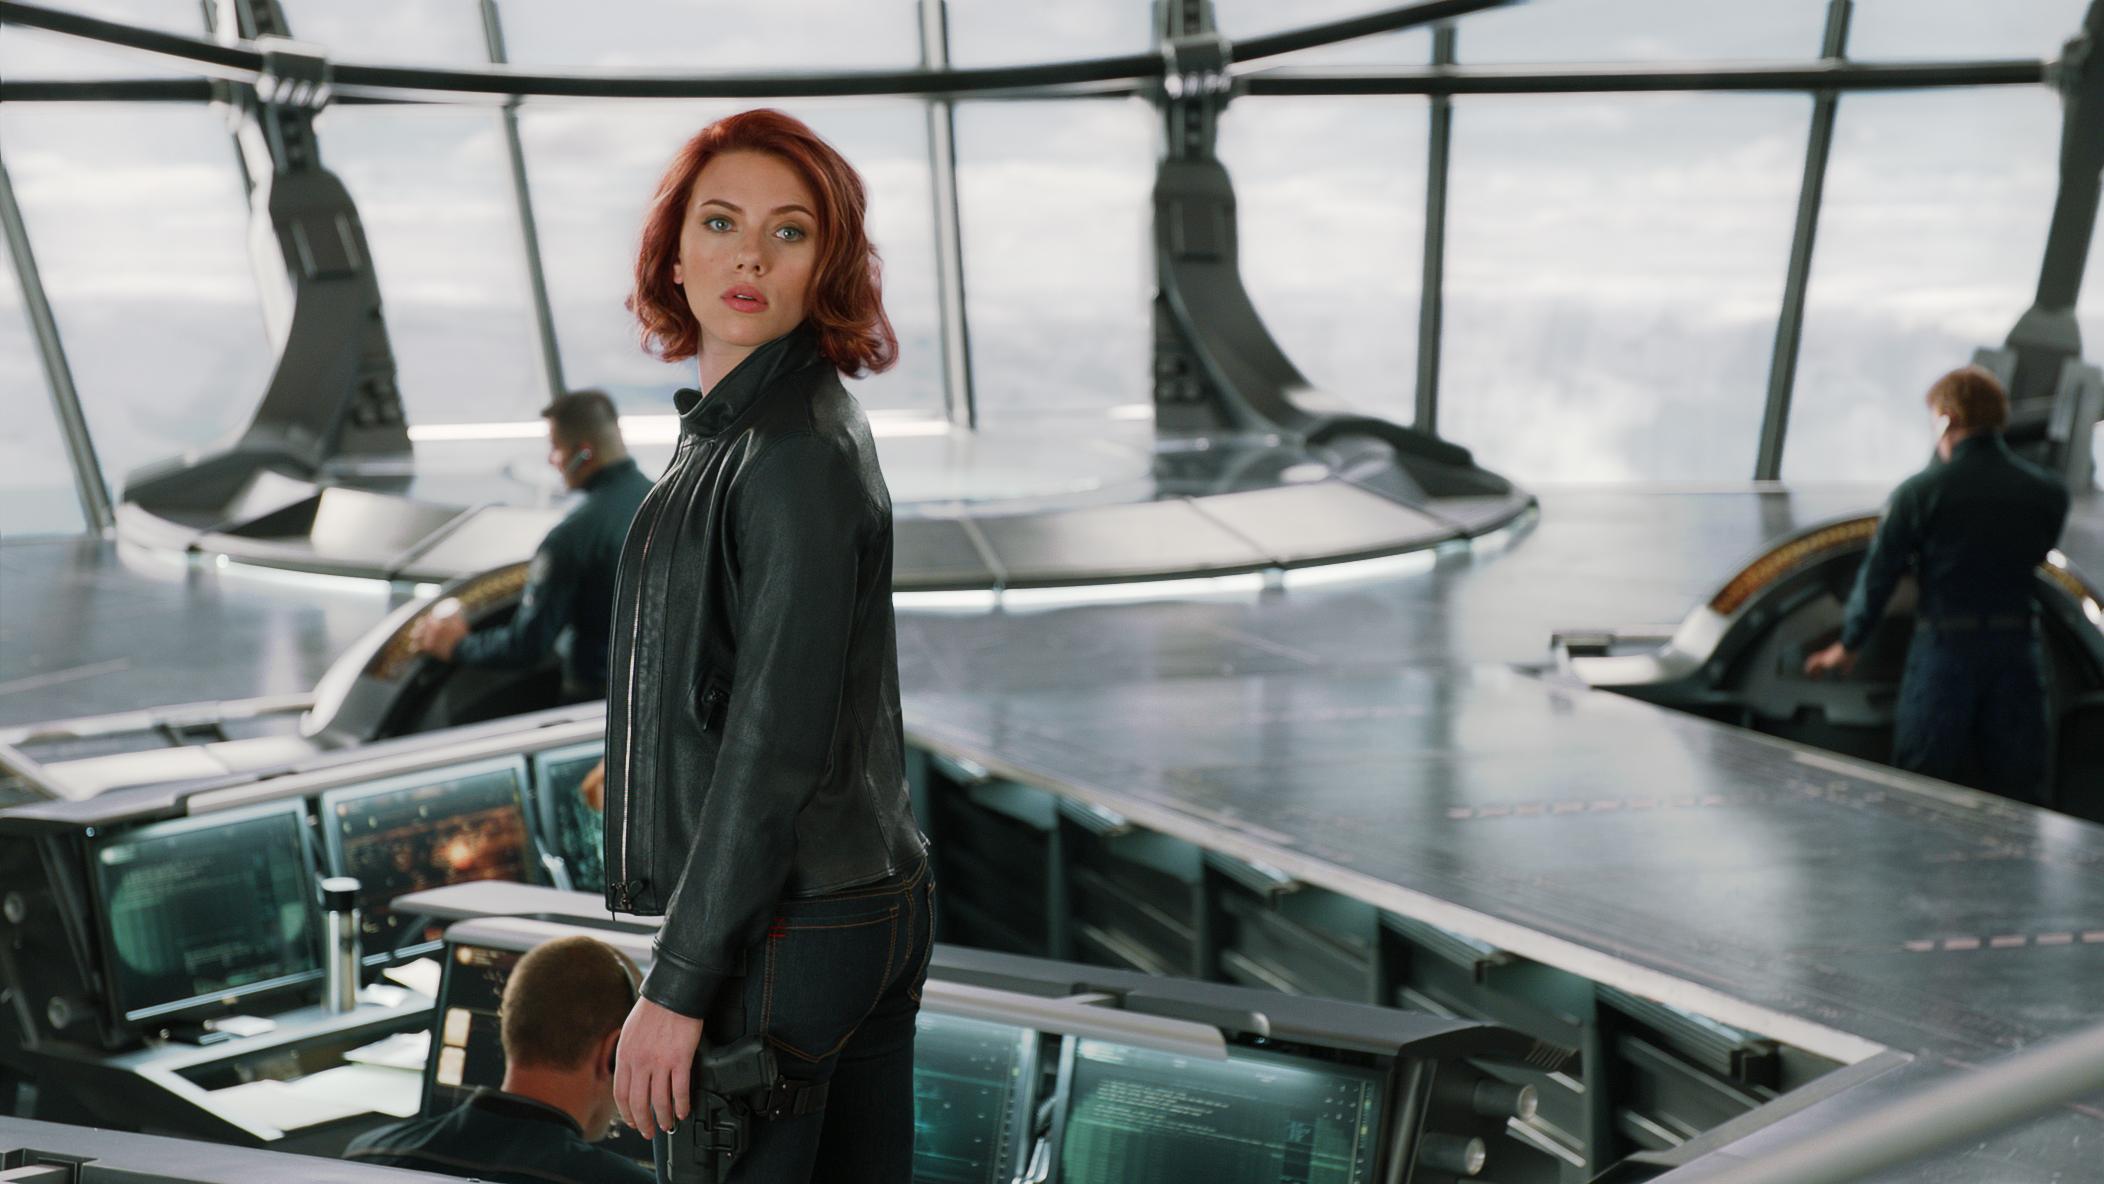 """Marvel's The Avengers"" Natasha Romanoff/Black Widow (Scarlett Johansson) Ph: Film Frame © 2011 MVLFFLLC. TM & © 2011 Marvel. All Rights Reserved."